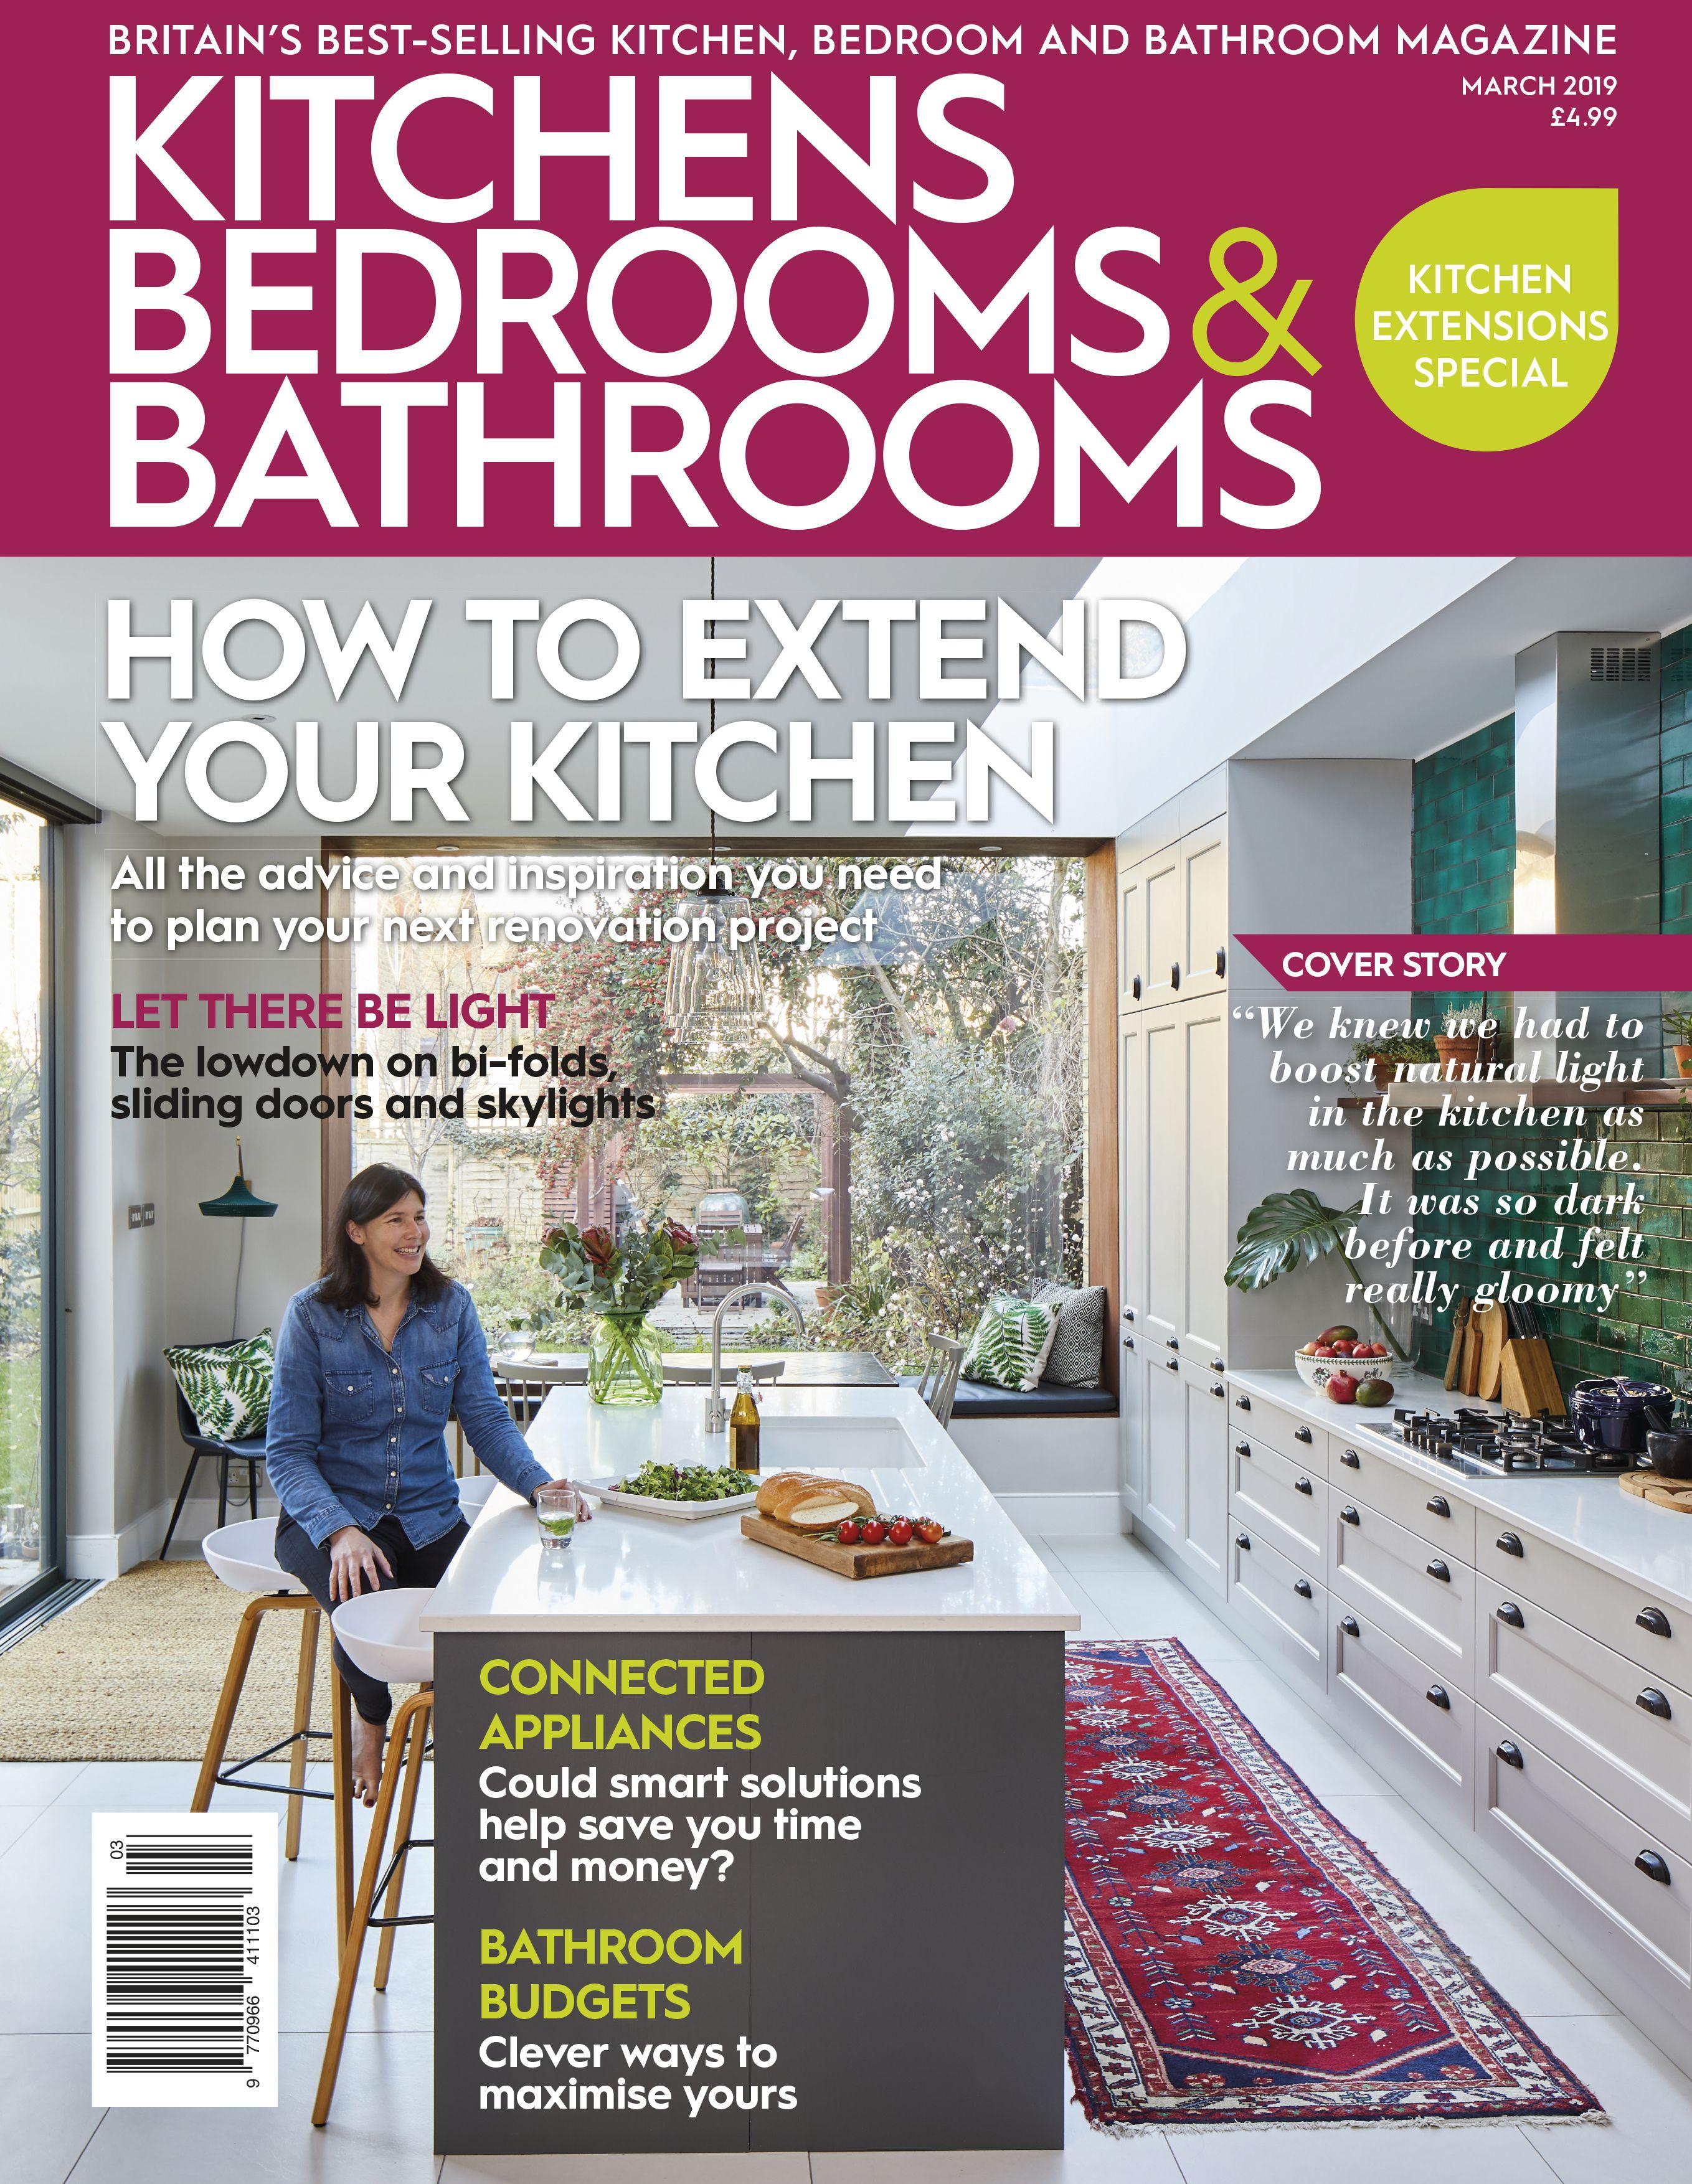 Kitchens Bedrooms Bathrooms Magazine March 2019 Kitchens And Bedrooms Kitchen Cabinets In Bathroom Kitchens Bathrooms